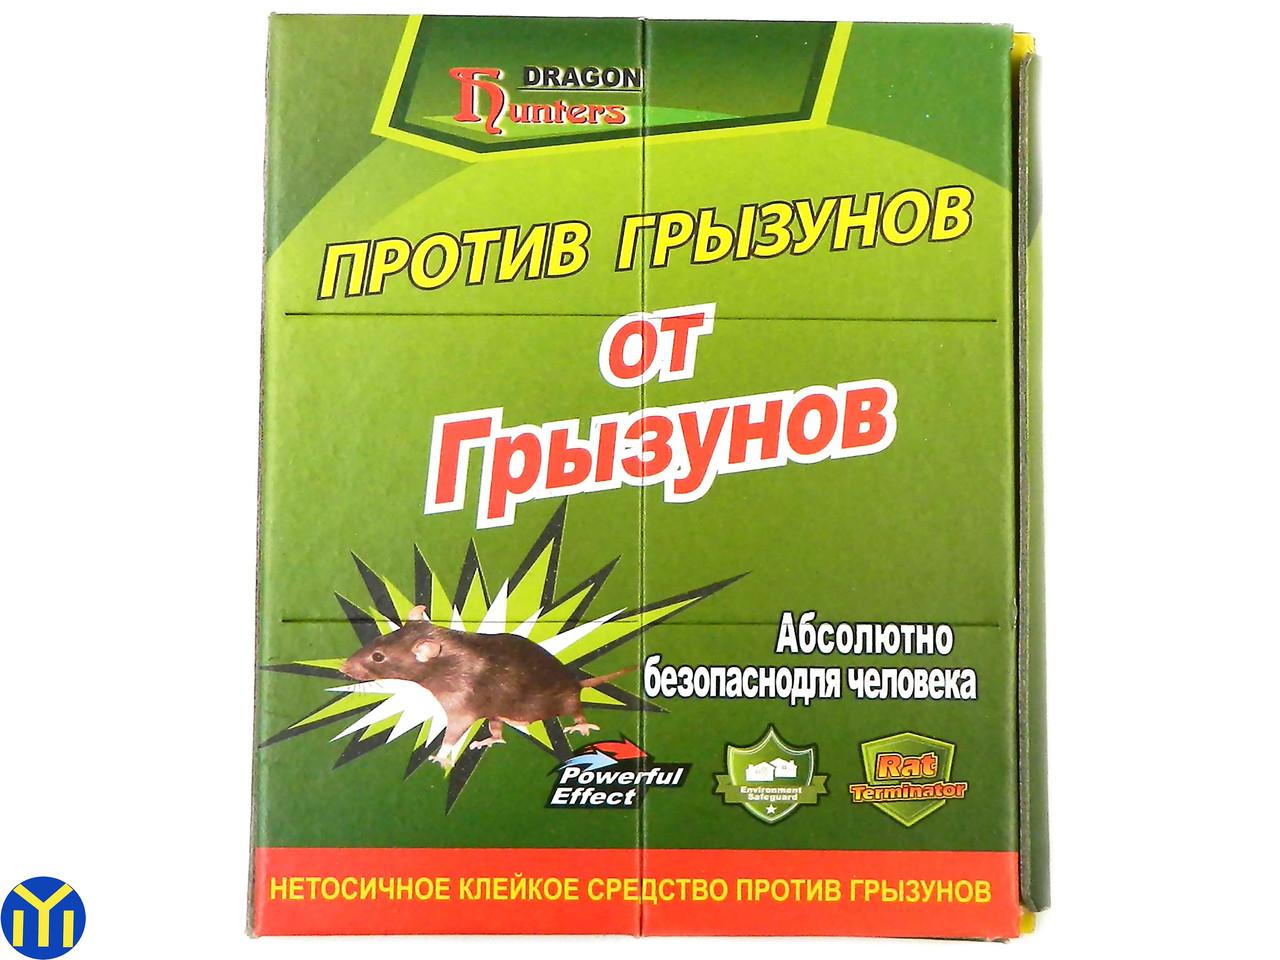 Клеевая ловушка Против Грызунов, книжка 21х15.5см